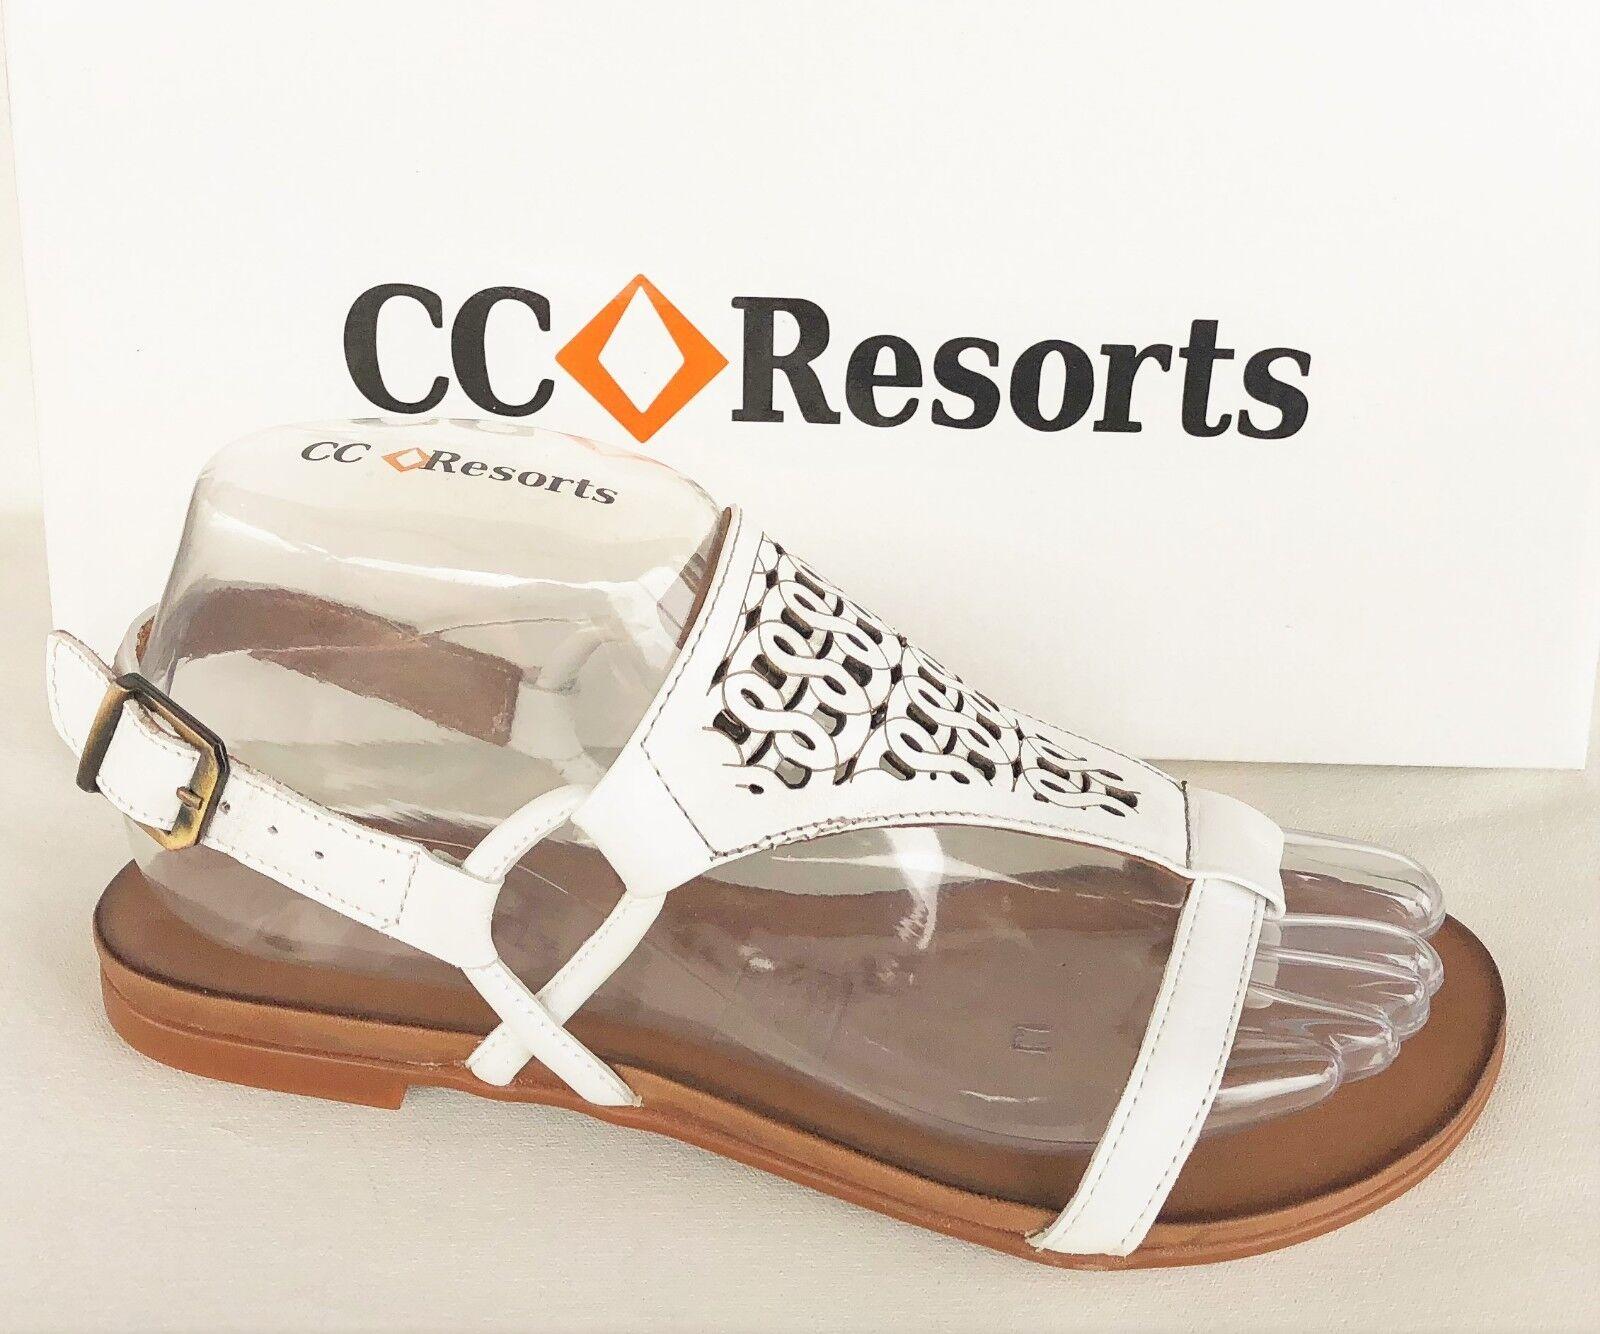 New leather flat Sandals  CC Resorts shoes - Larissa